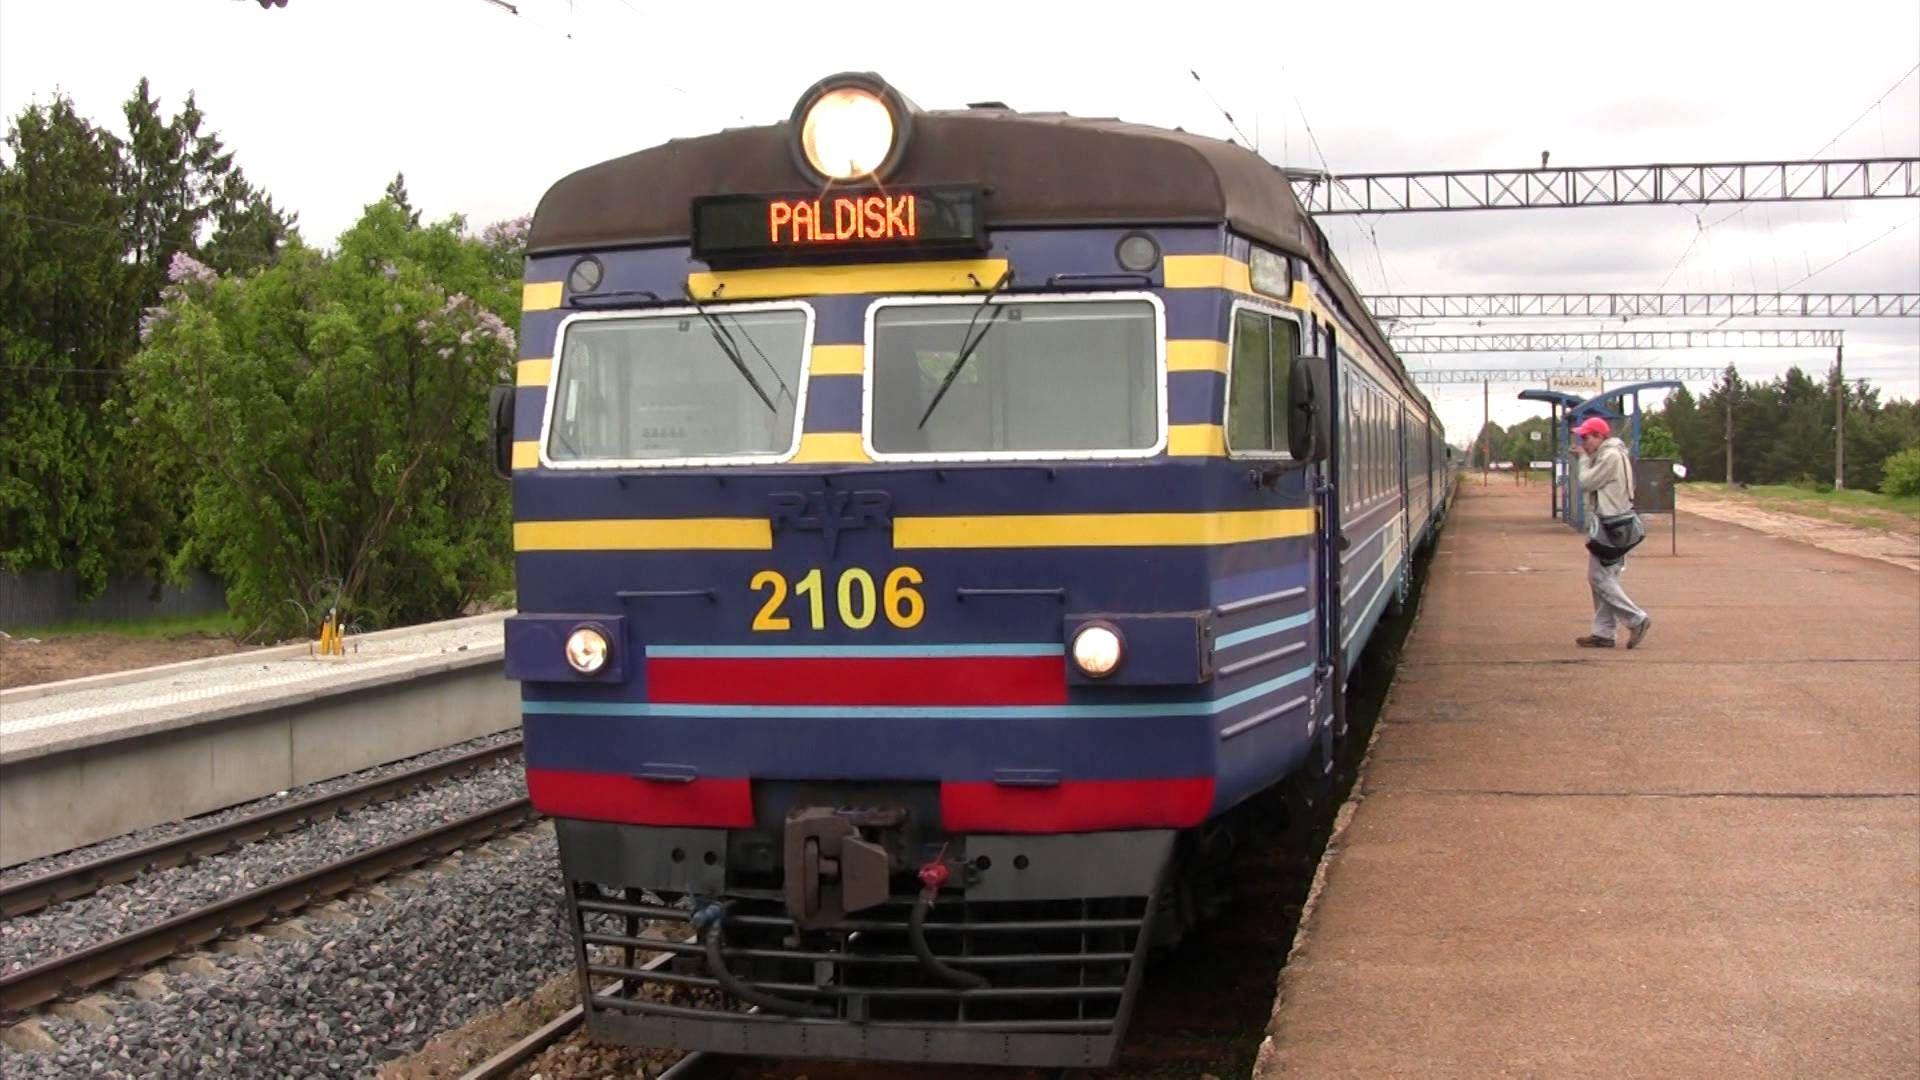 Электропоезд ЭР2-1293 в ст. Пяэскюла, Таллин, Эстония, 09.06.2012 ER2-1293 EMU at Pääsküla station, Tallinn, Estonia, 09.06.2012